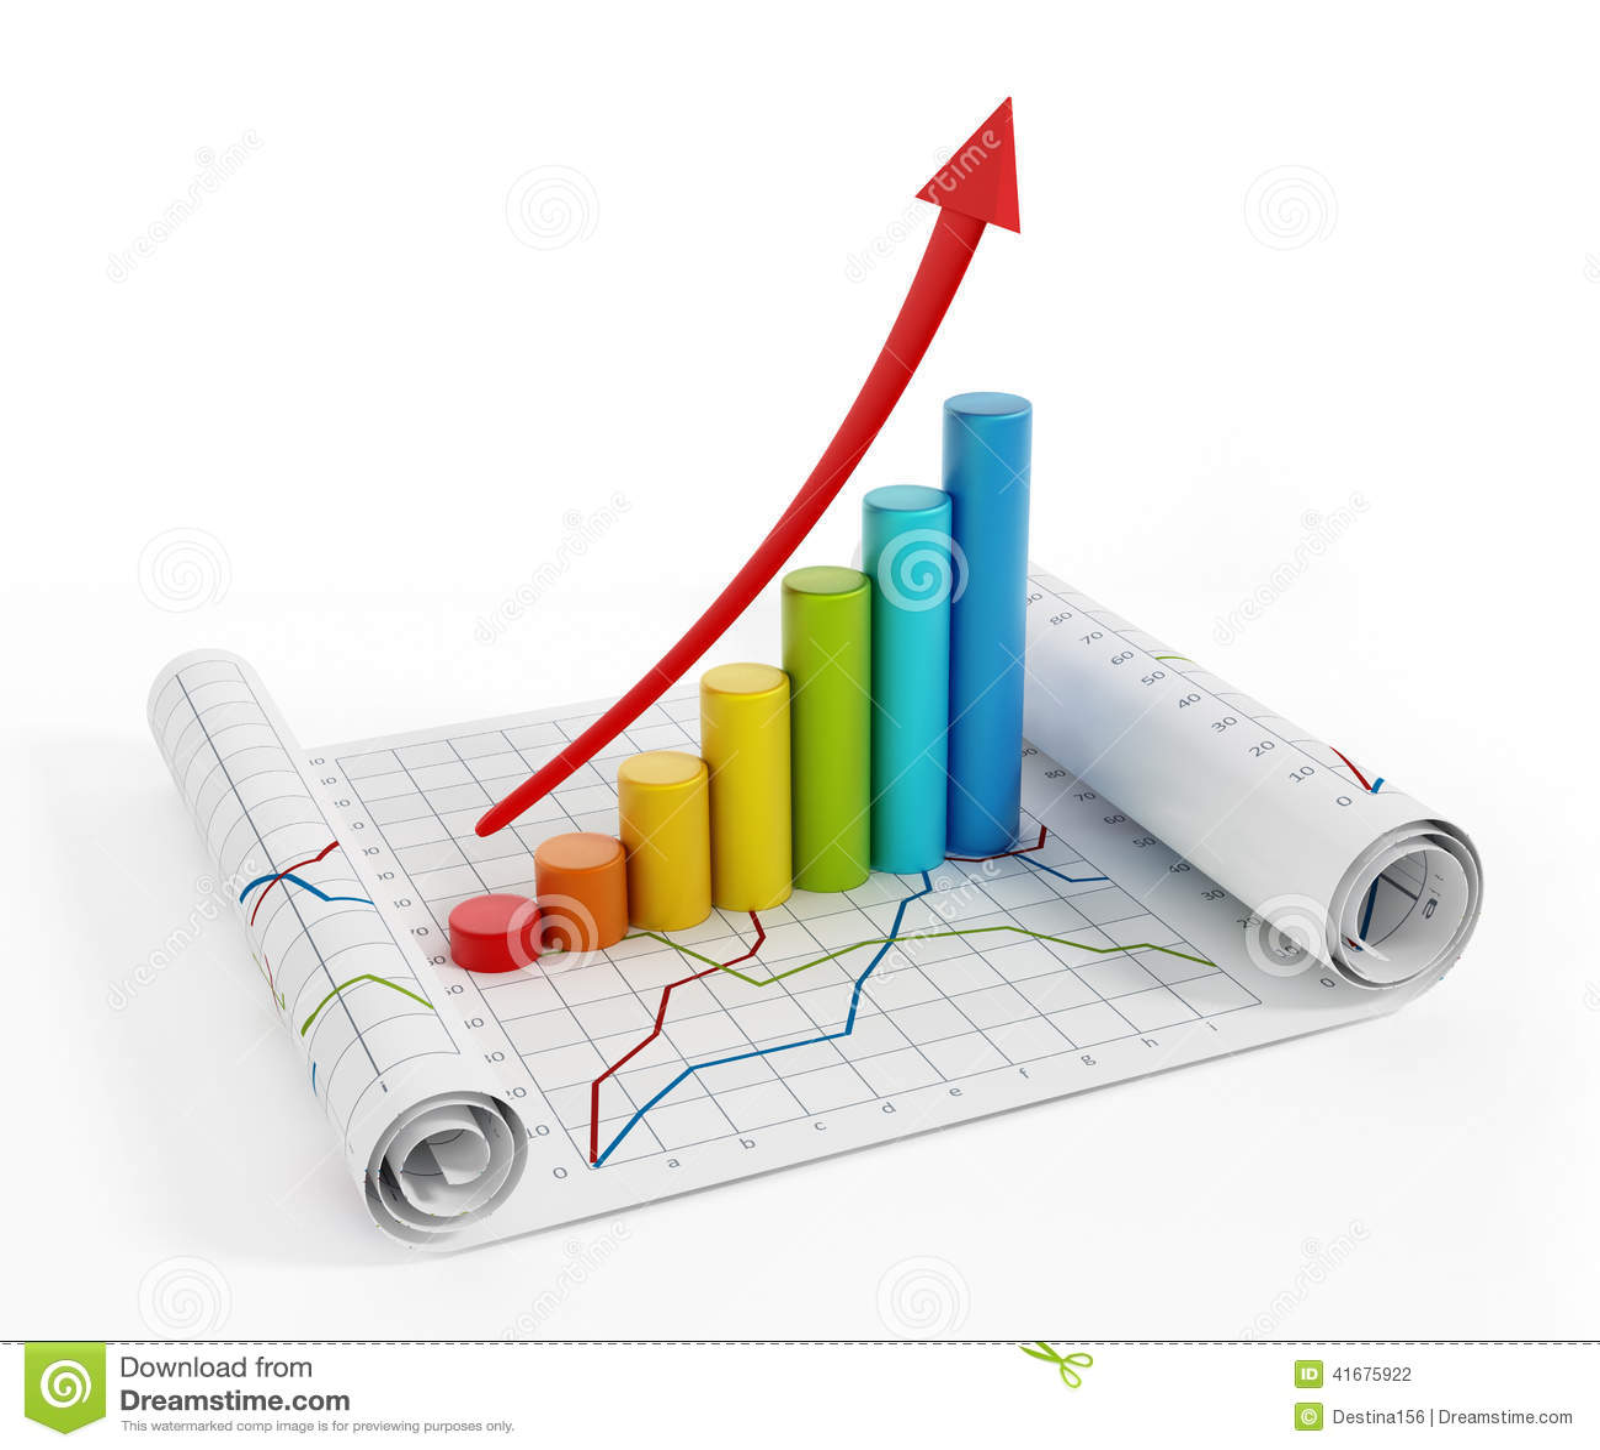 Finance Graphics: Financial Graphics Stock Photo